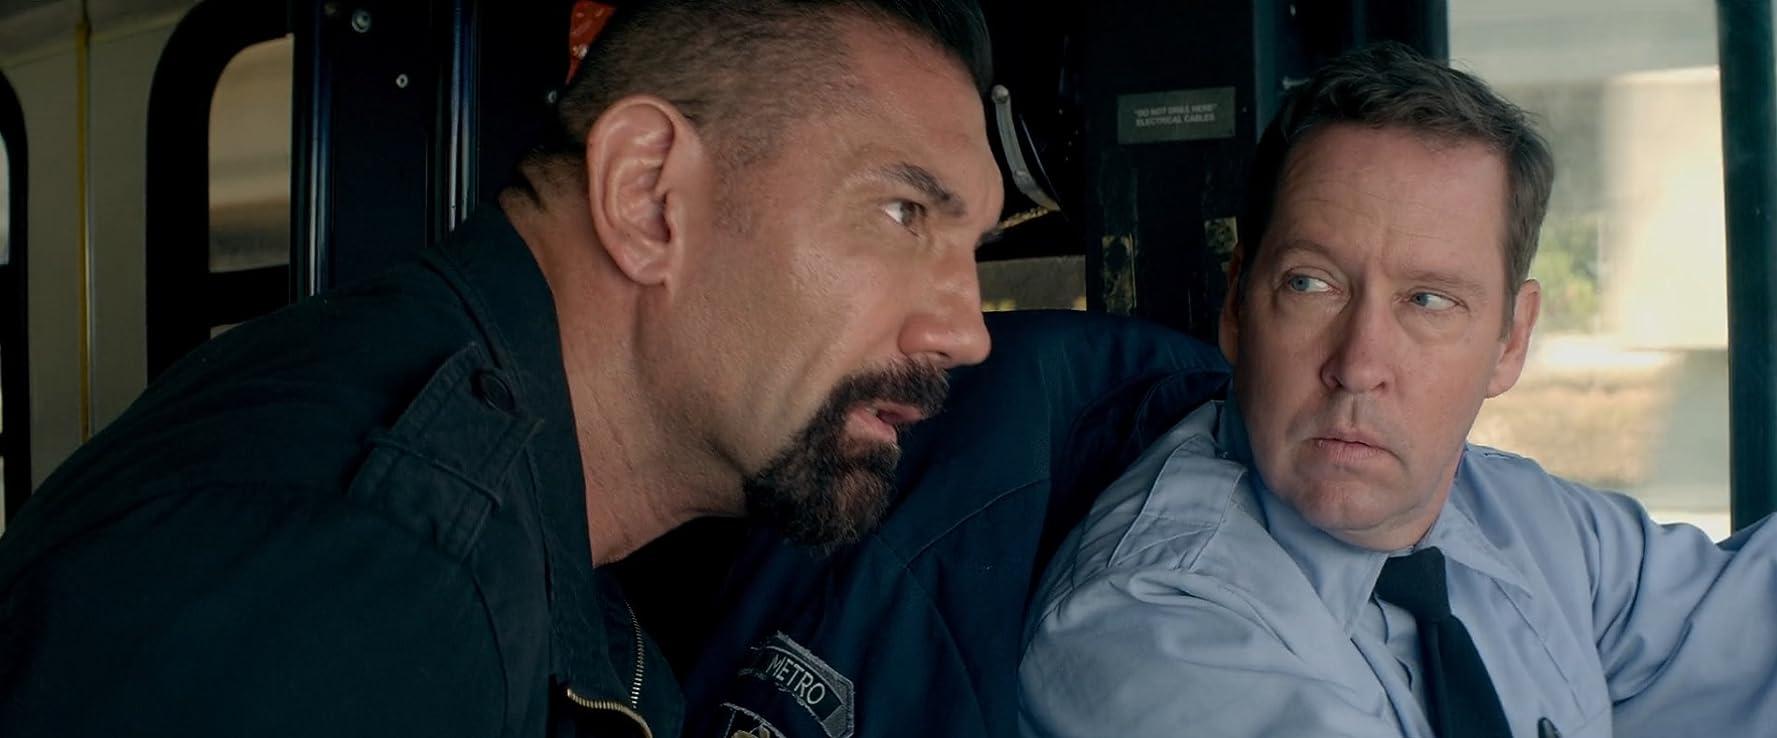 D.B. Sweeney and Dave Bautista in Heist (2015)